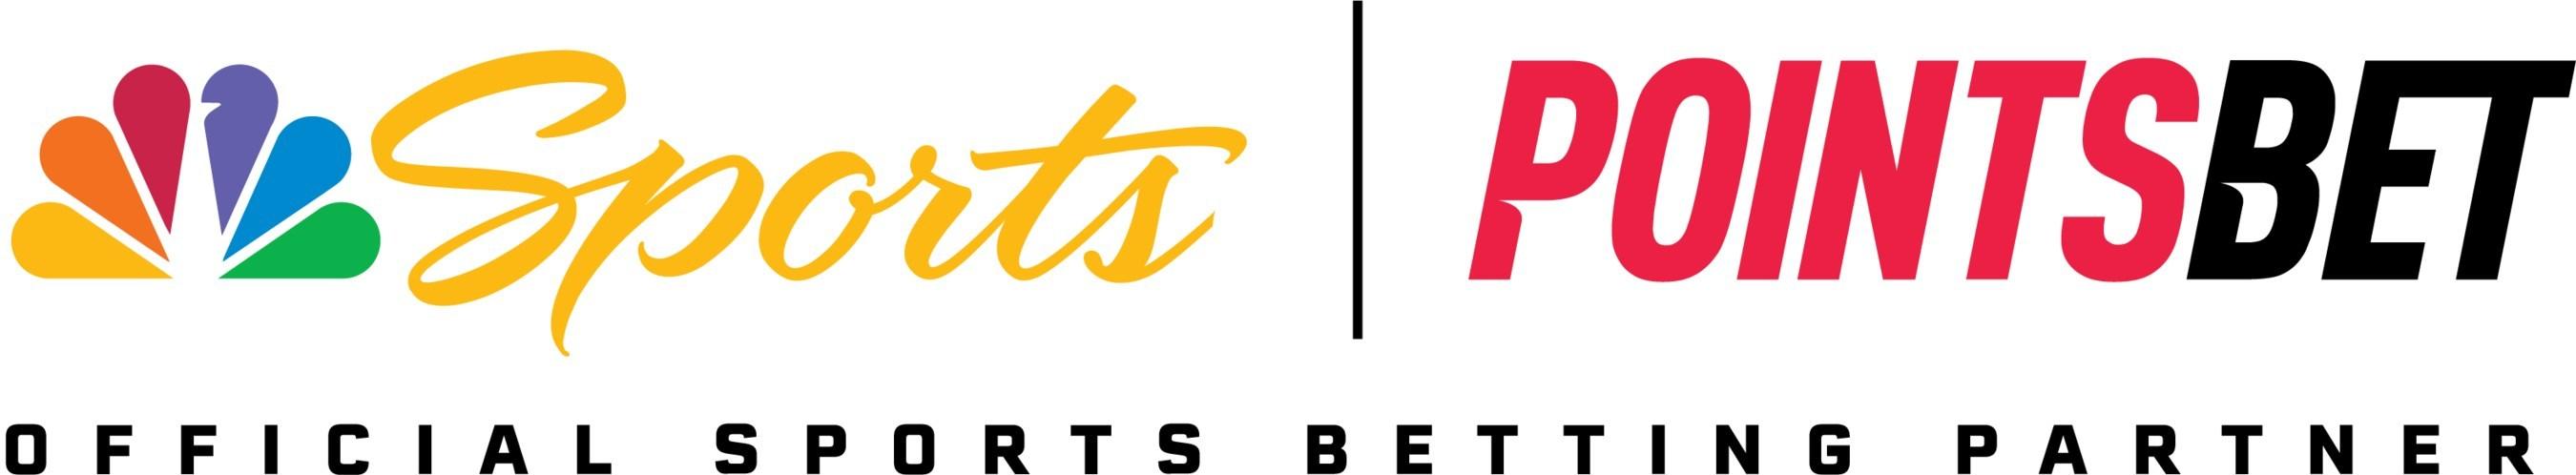 World sports betting branches of chemistry vitesse vs twente bettingexpert football